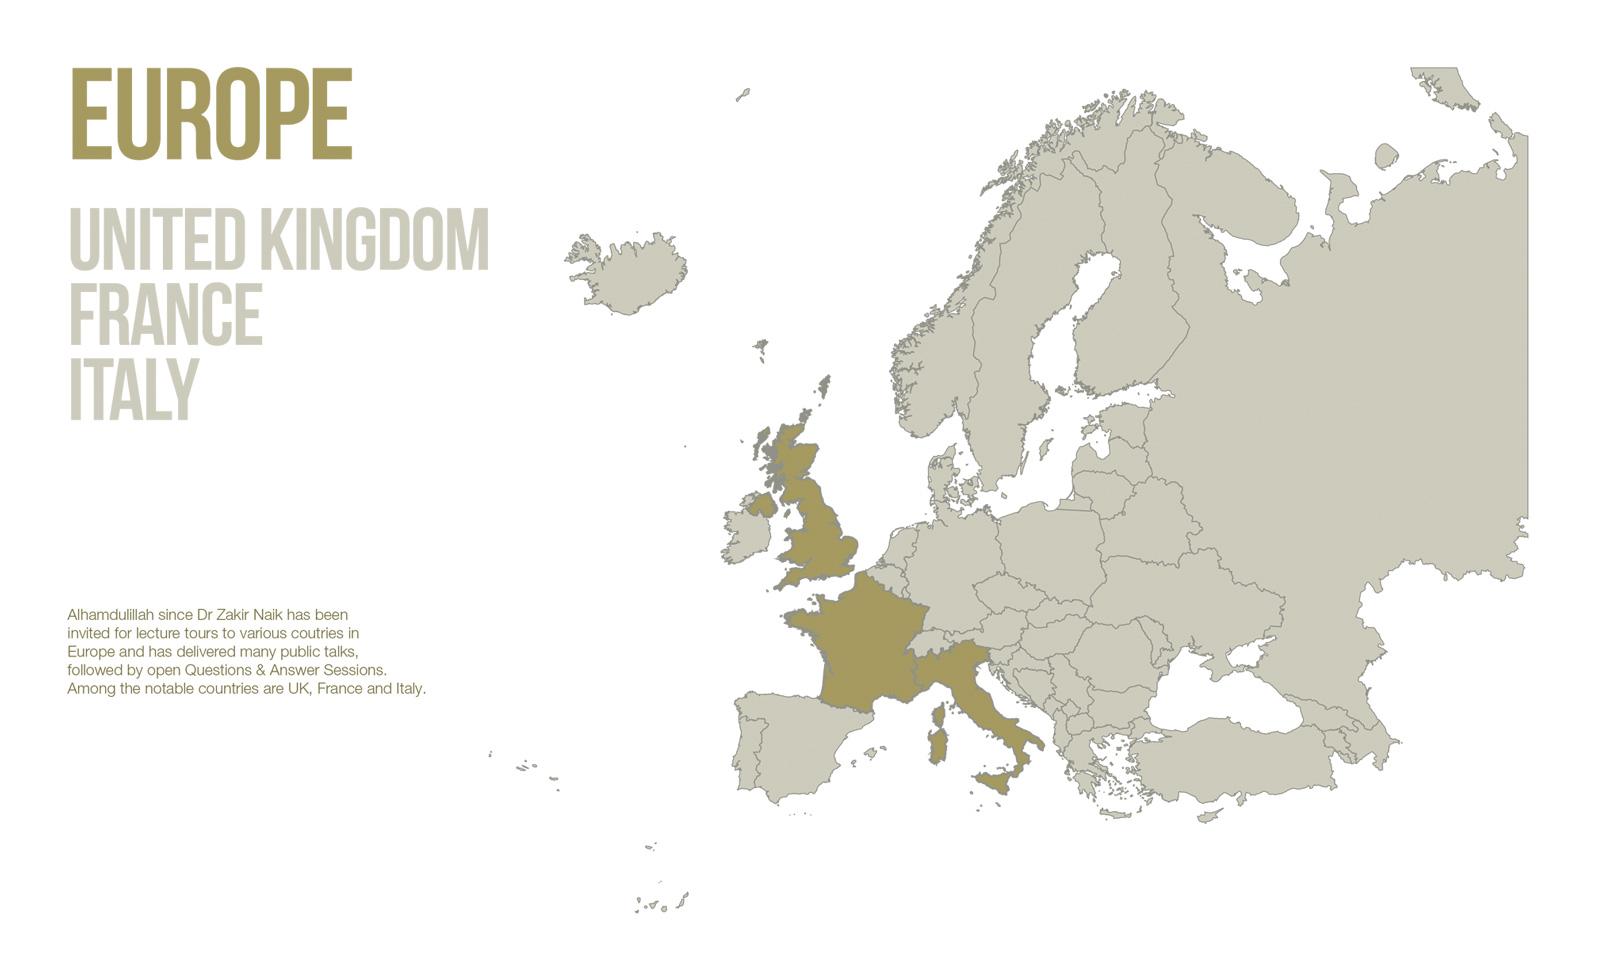 Public Lectures - Europe